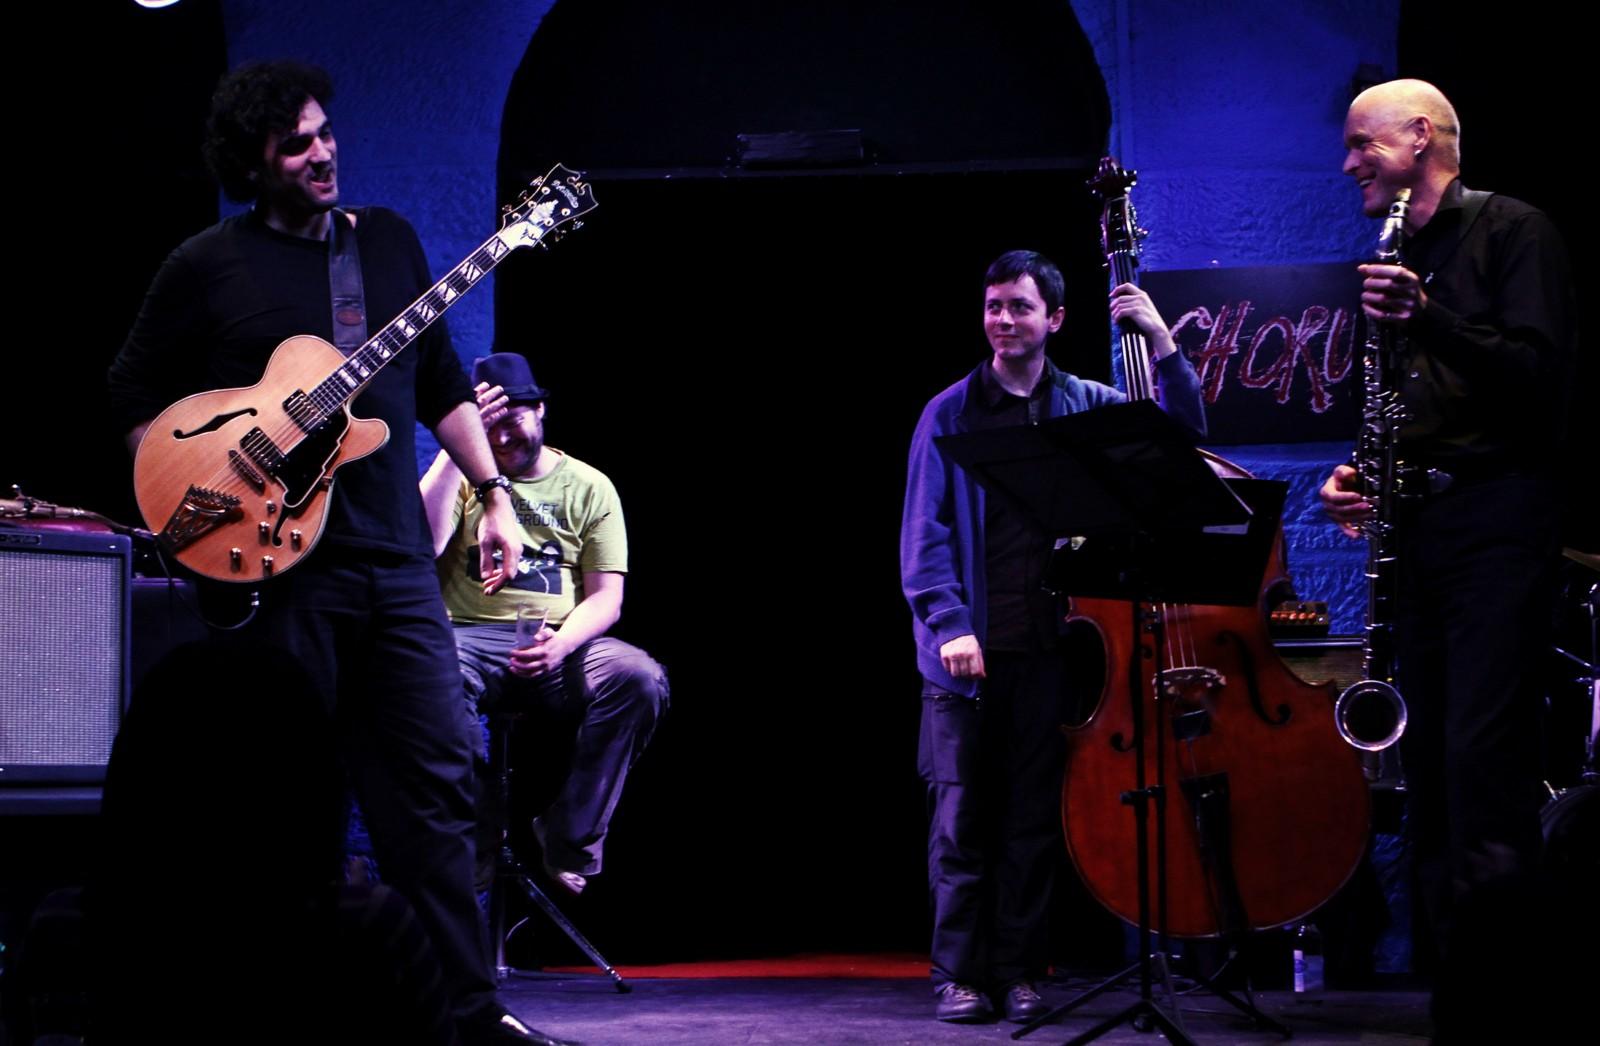 Scott DuBois Quartet live in Lausanne, Switzerland